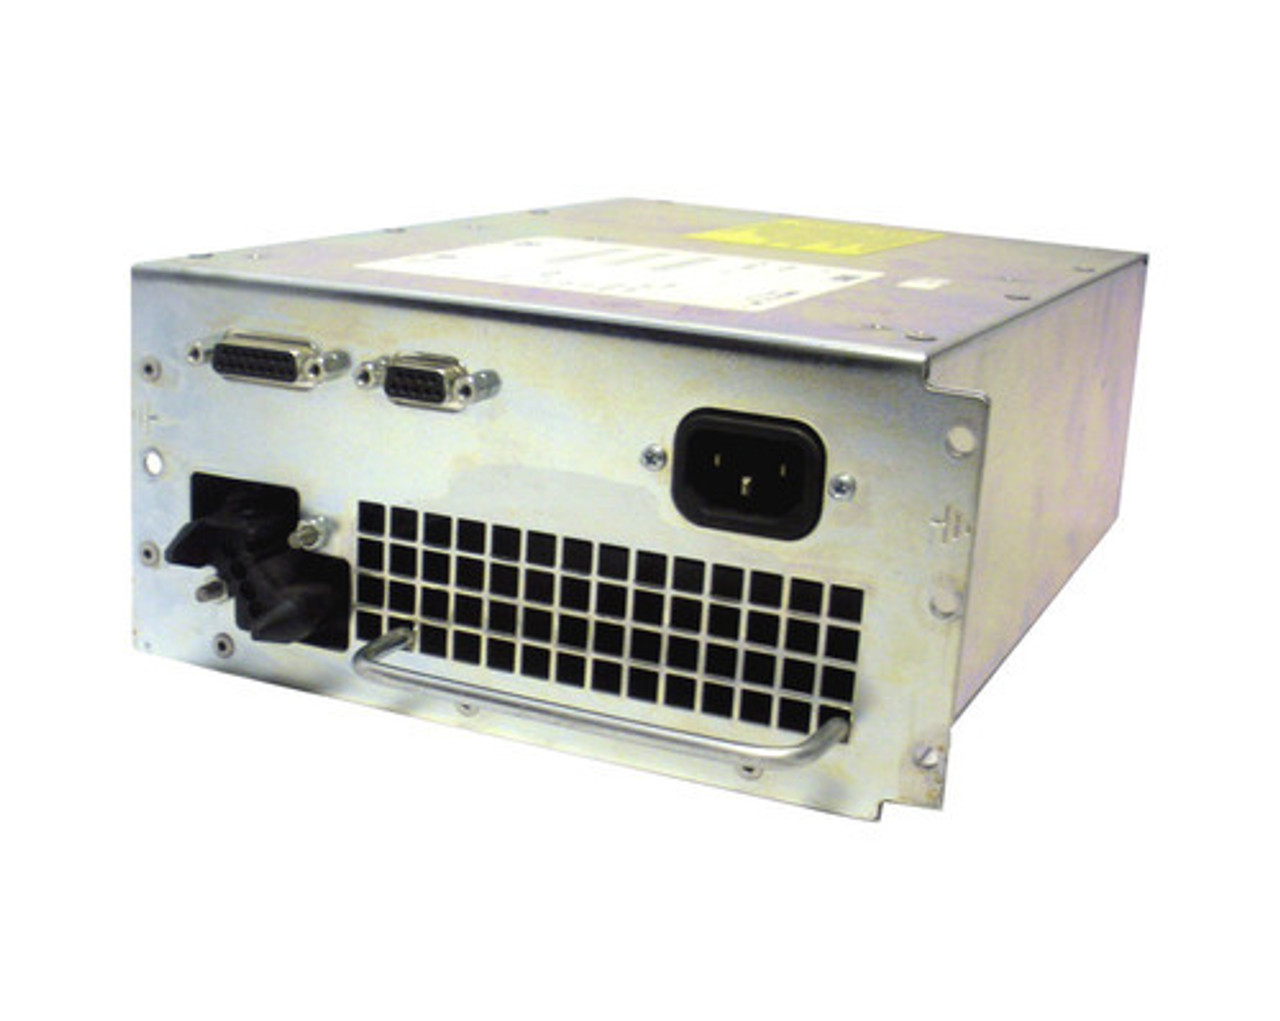 IBM AS/400 iSeries Power Supplies